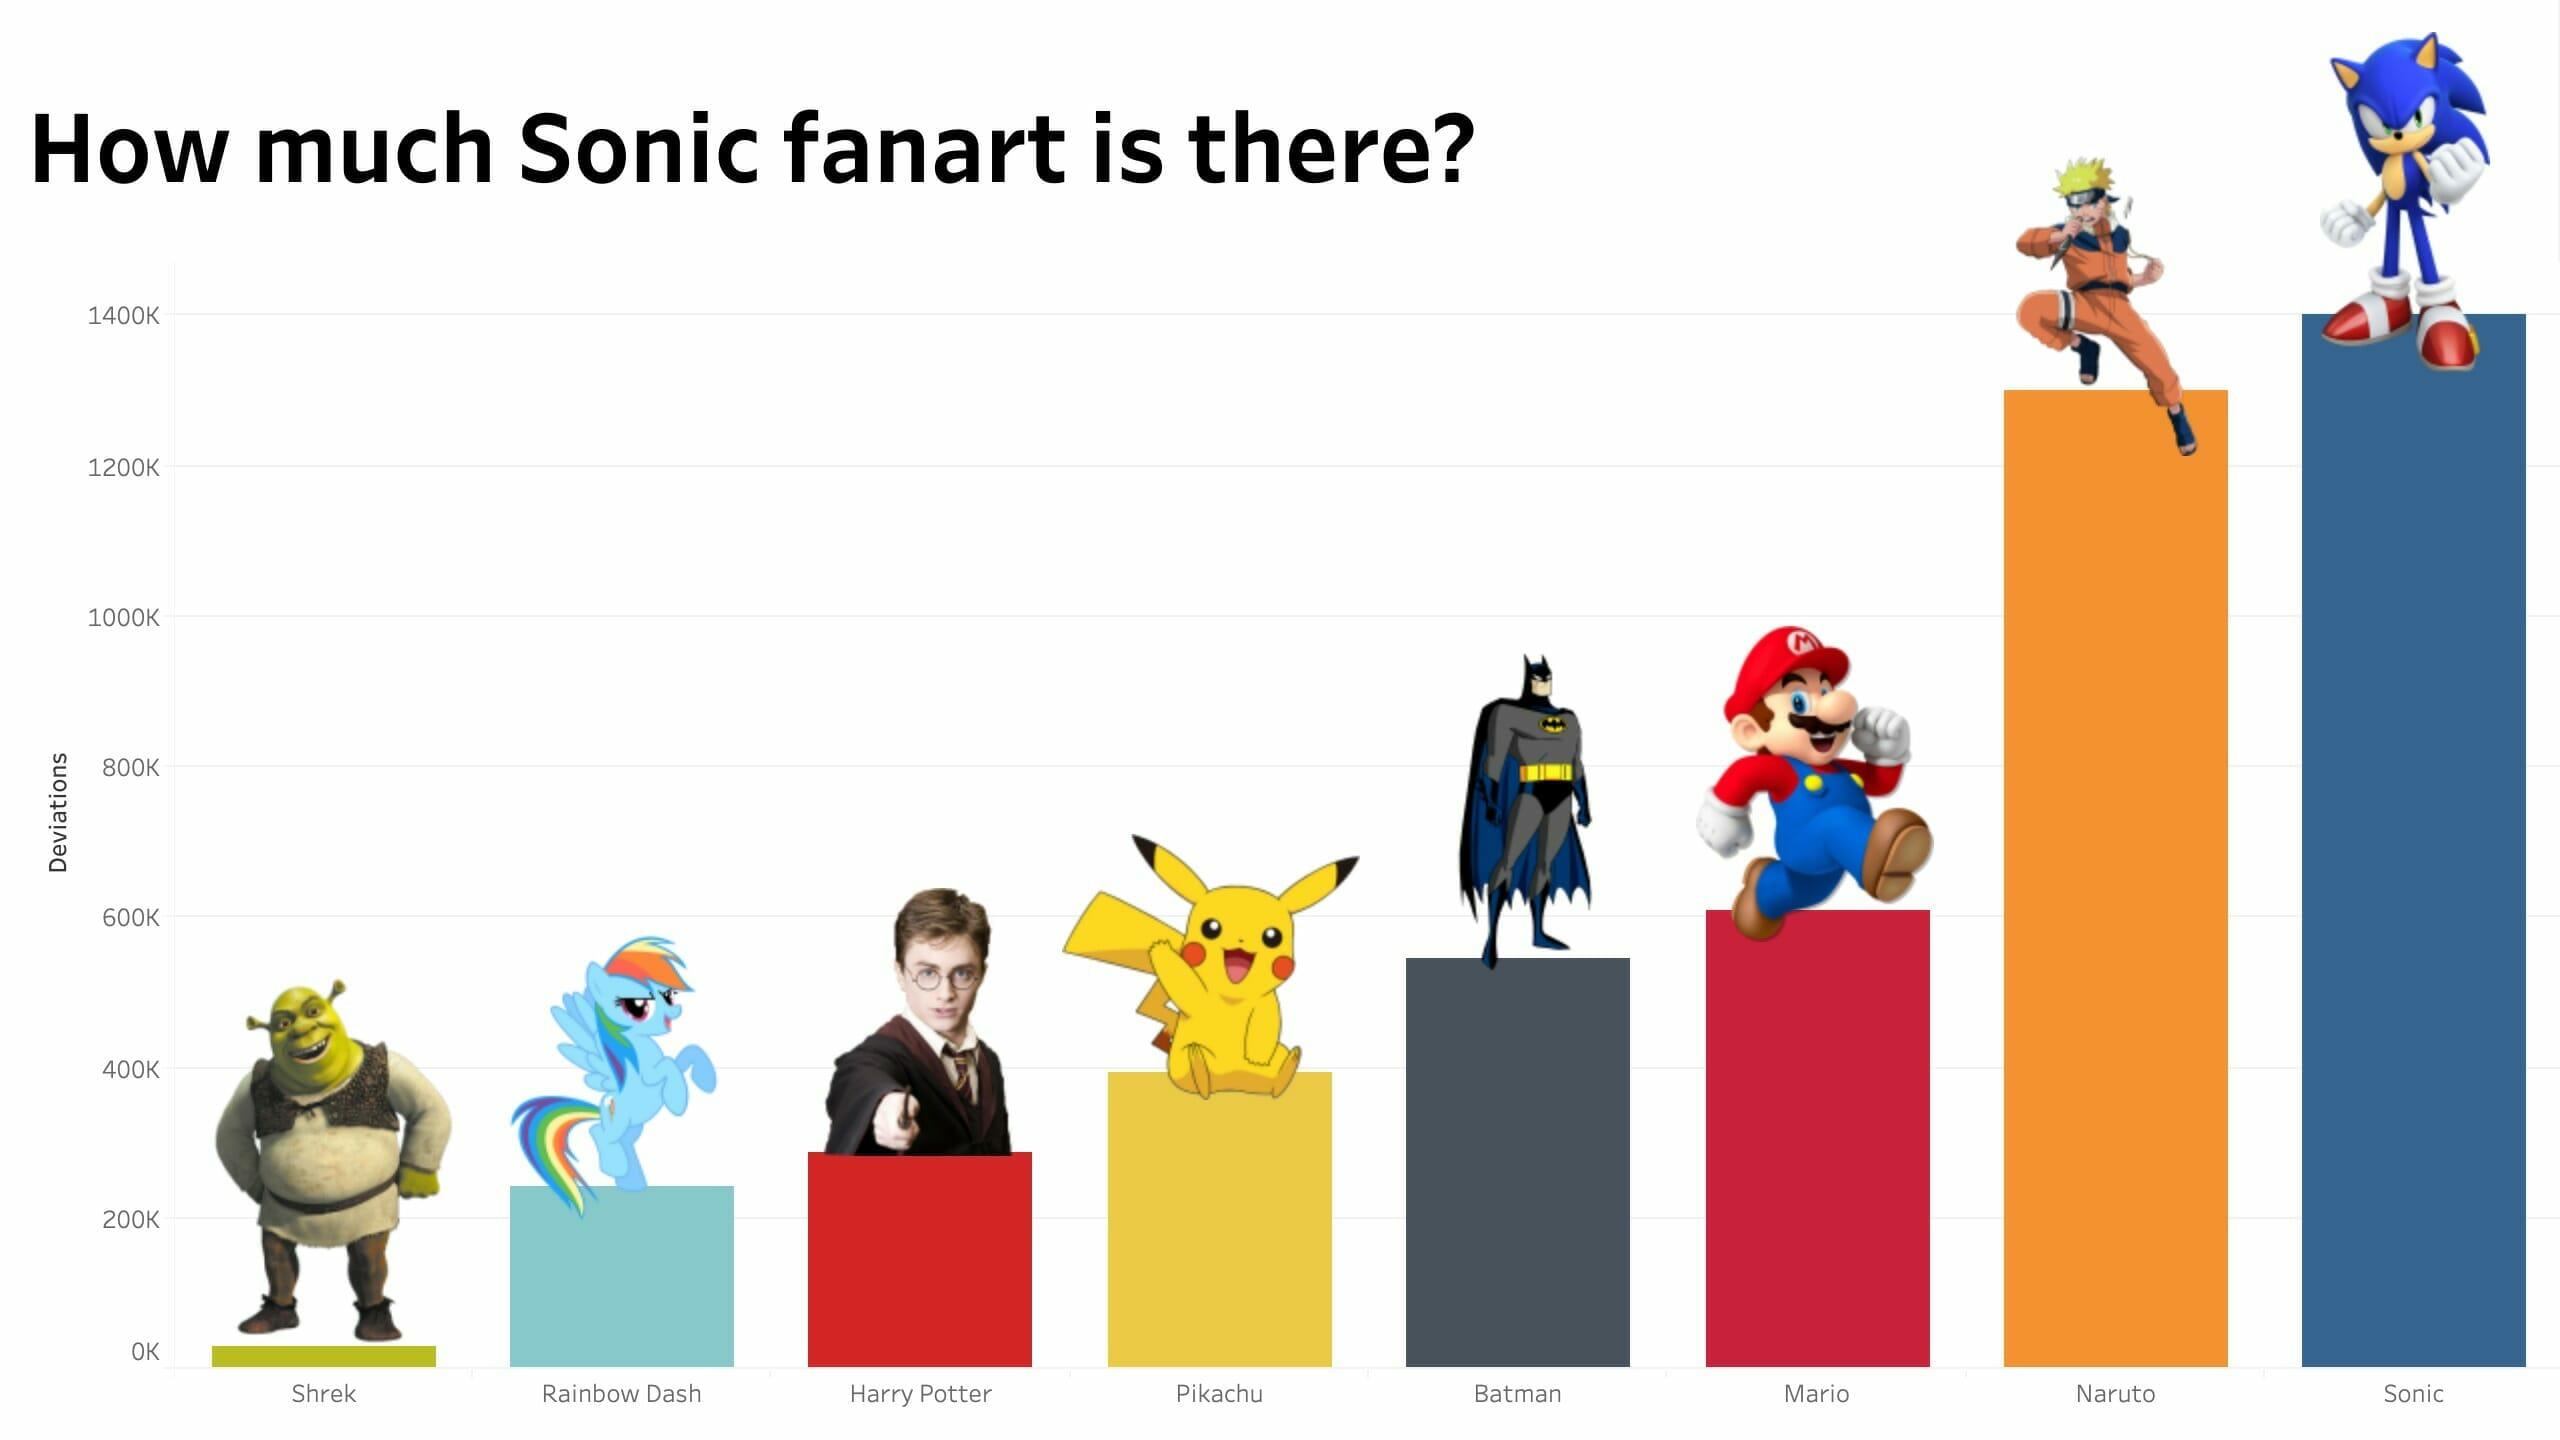 Sonic The Surprising Champion Of Fan Art